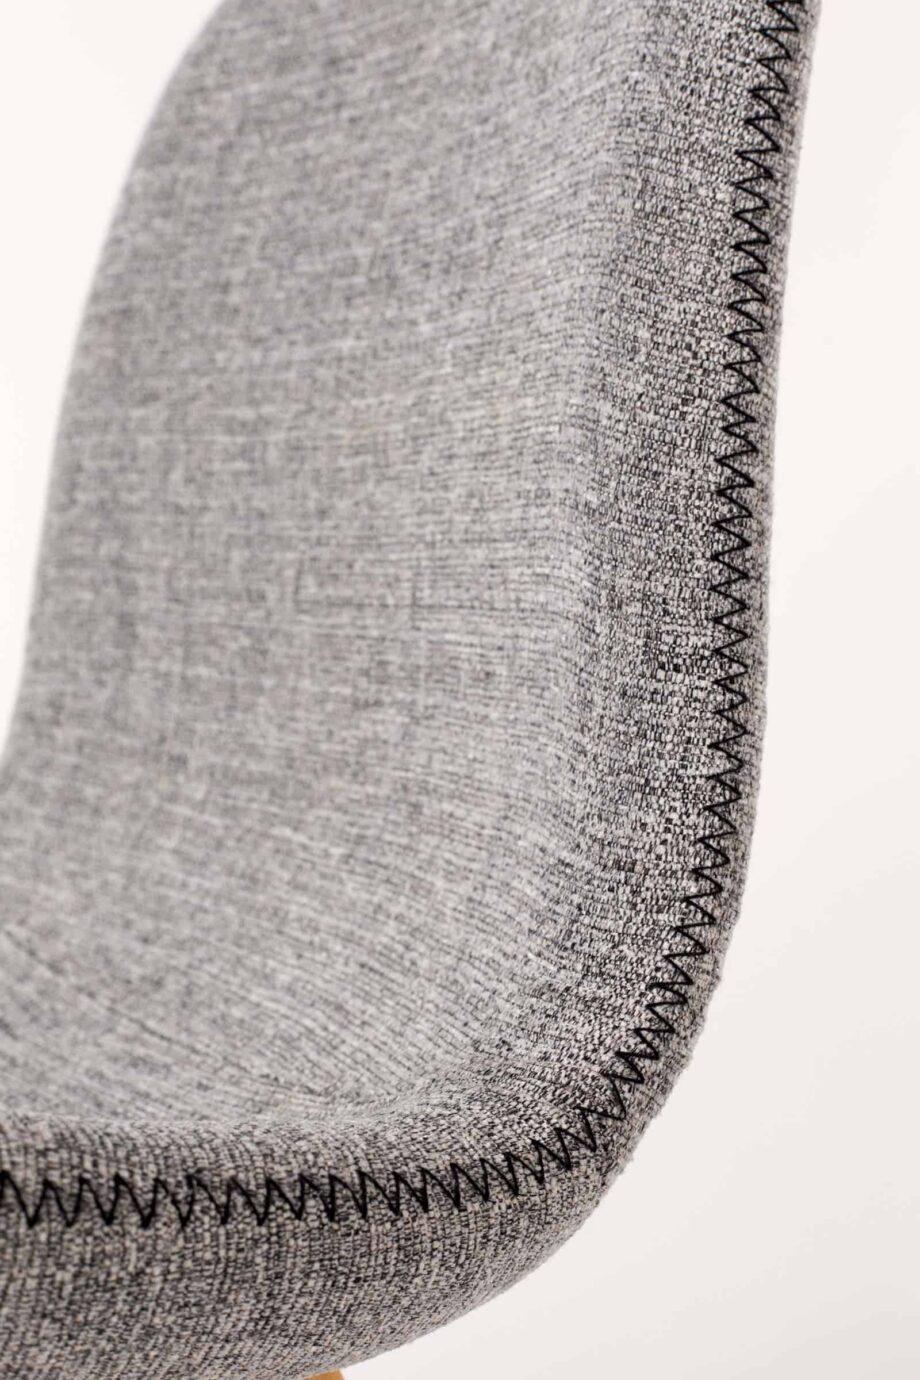 Lester stoel Designshopp lichtgrijs 7